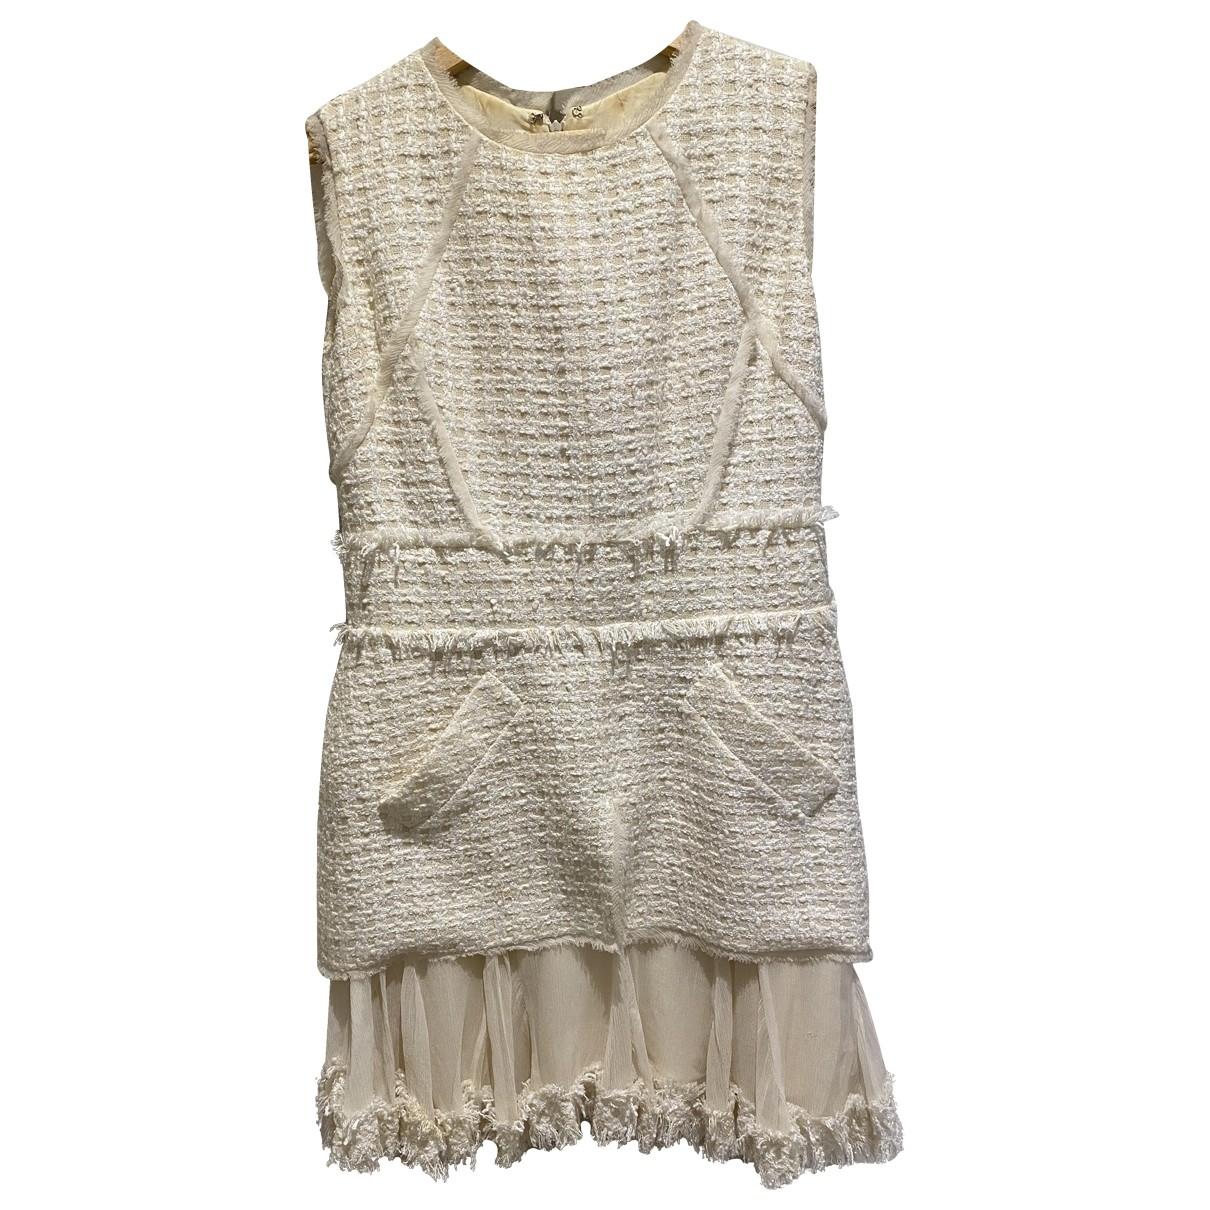 Oscar De La Renta N Tweed dress for Women 8 UK